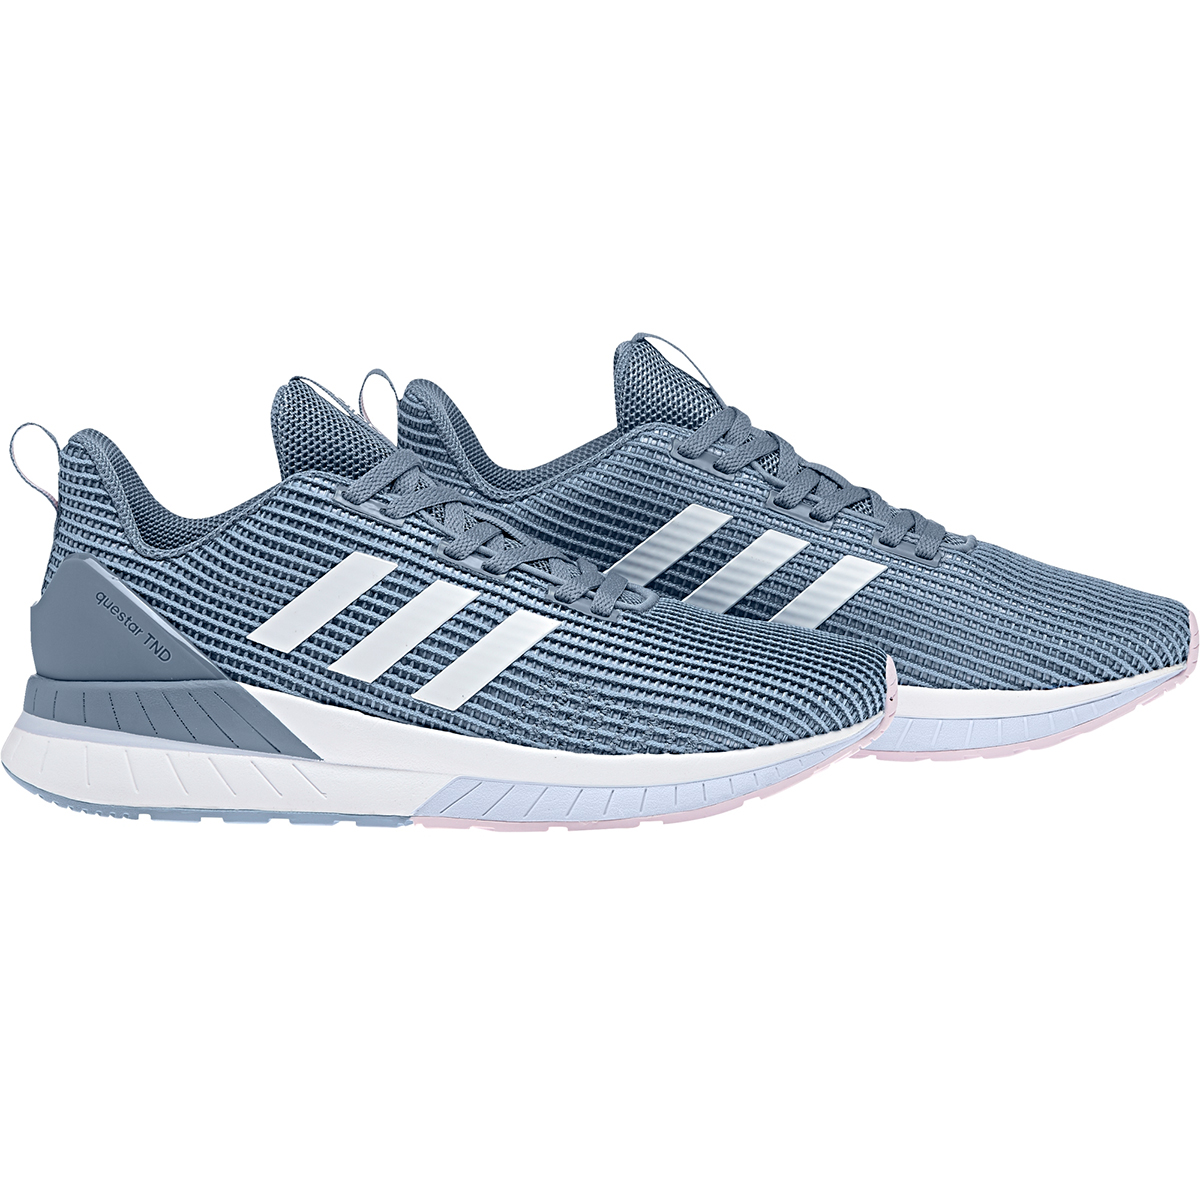 adidas questar tnd ladies running shoes